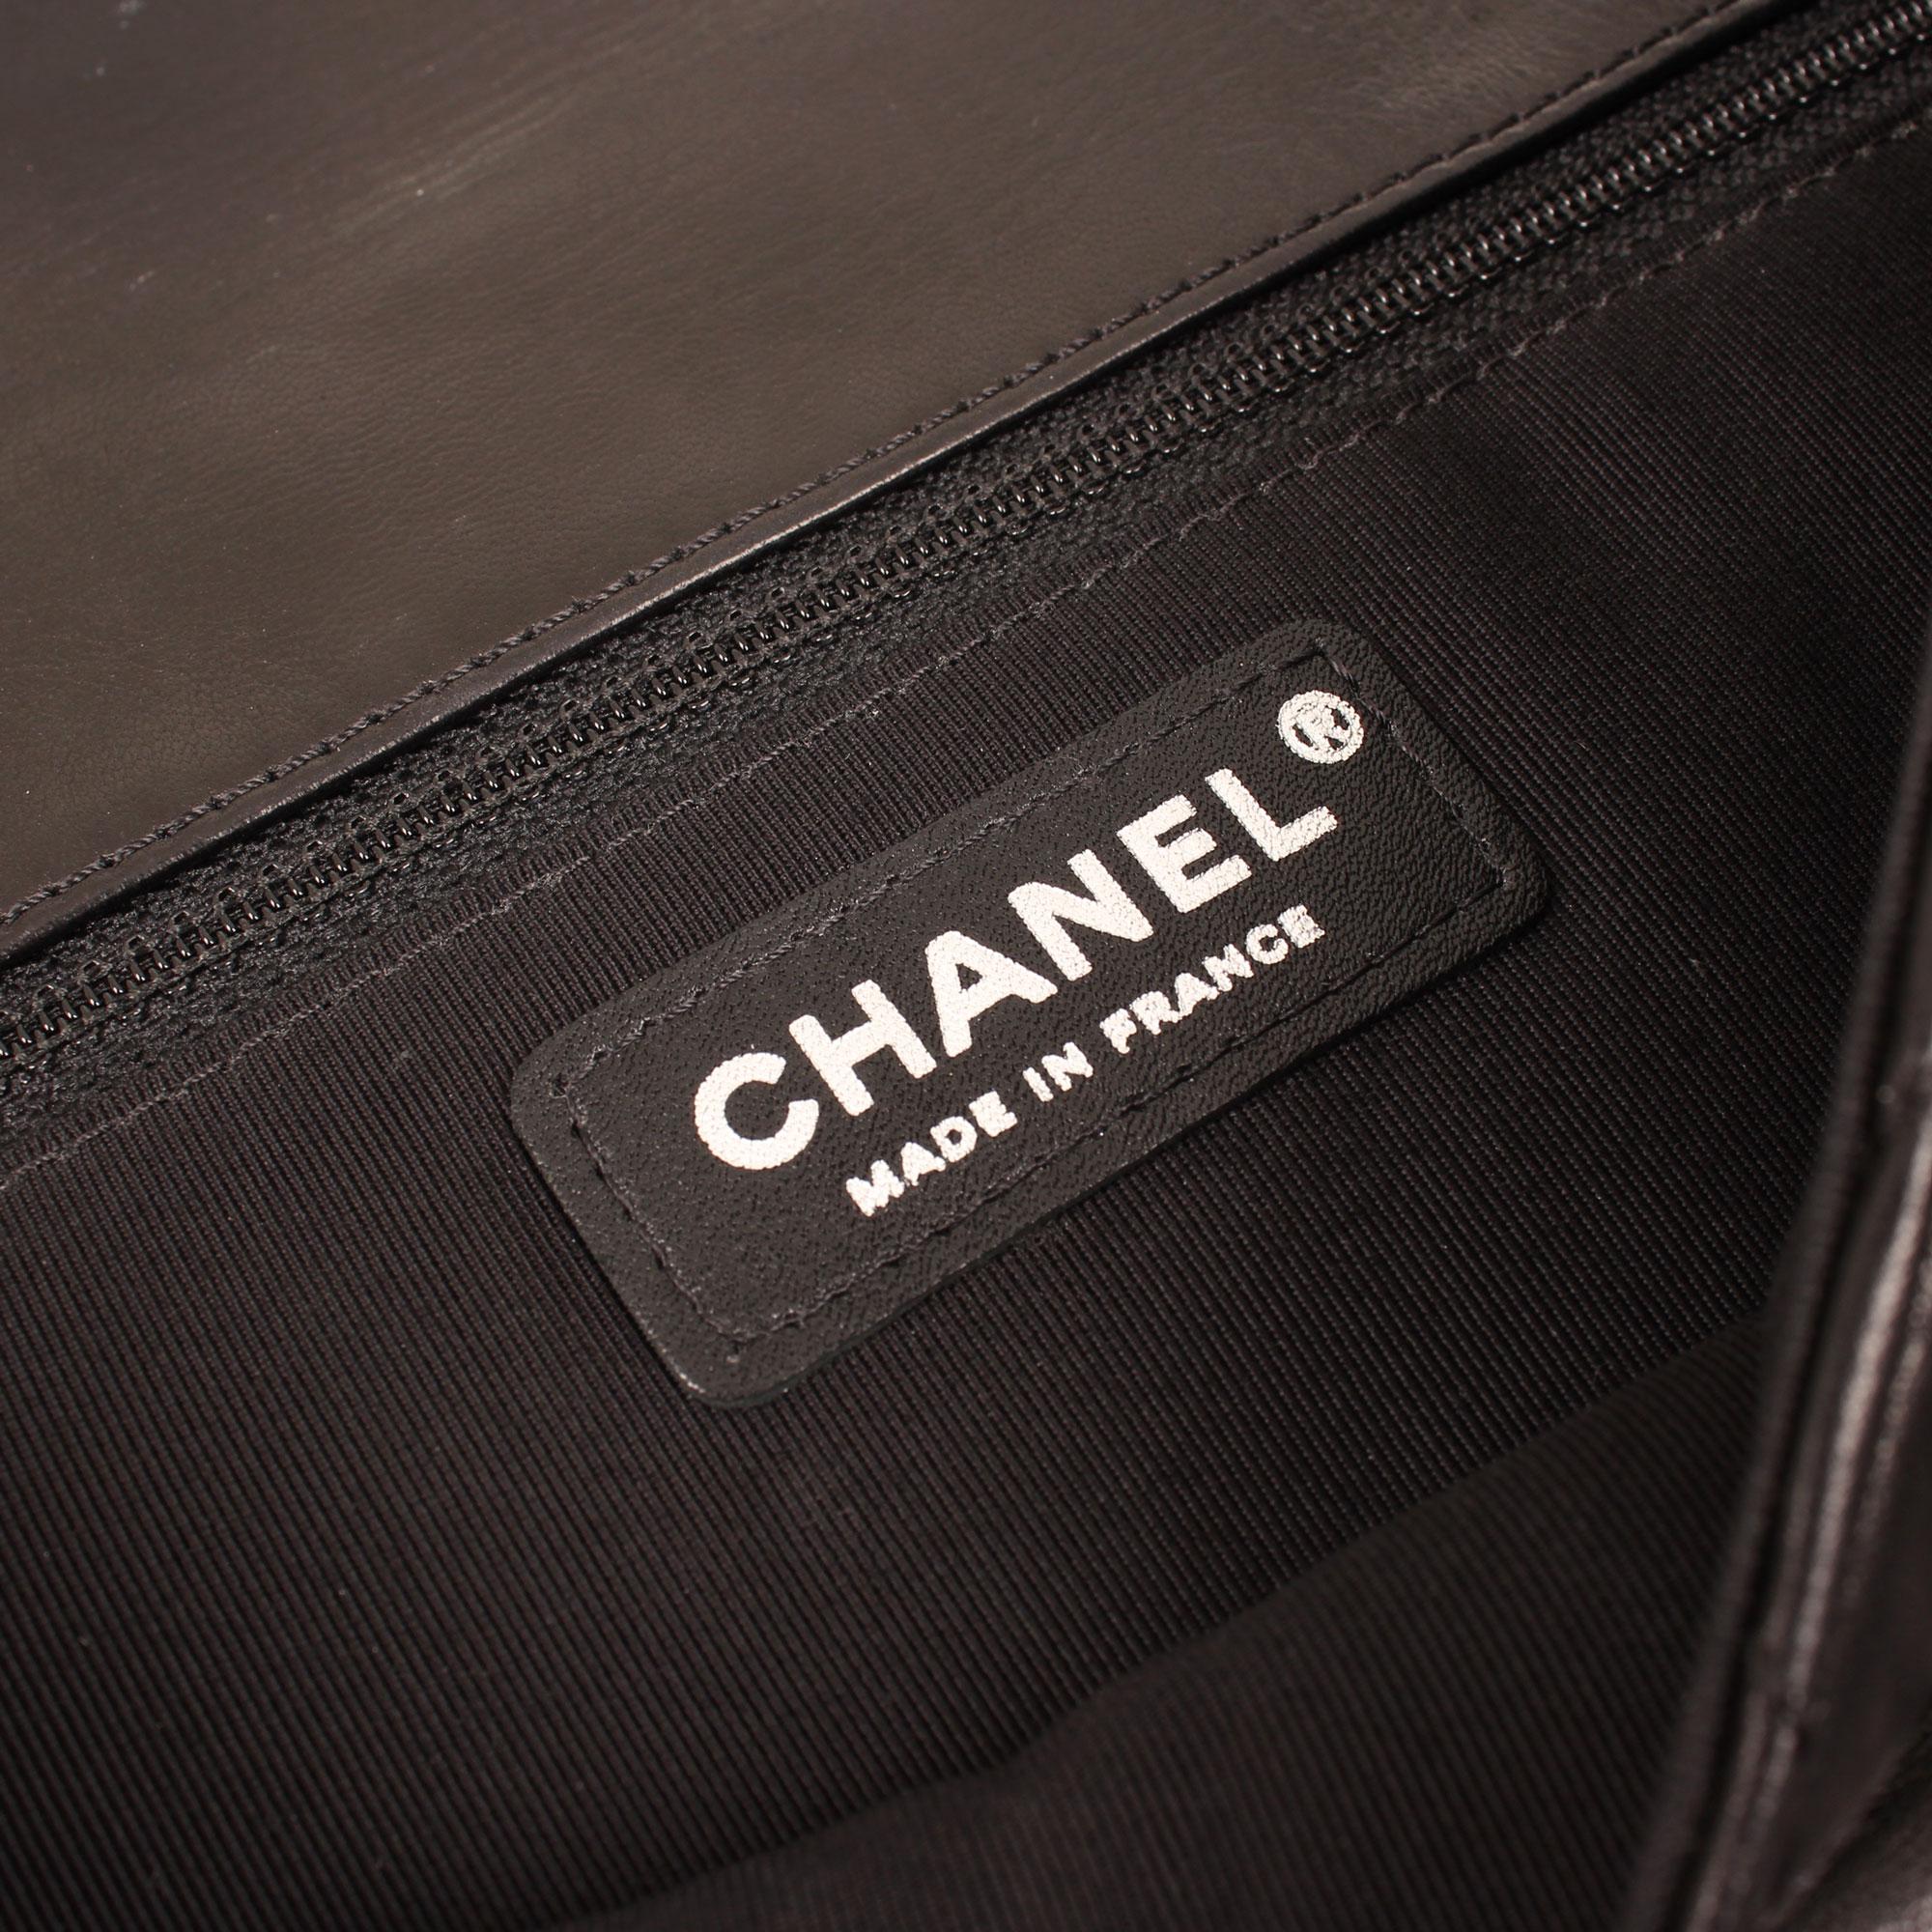 bag-chanel-hula-hoop-black-brand